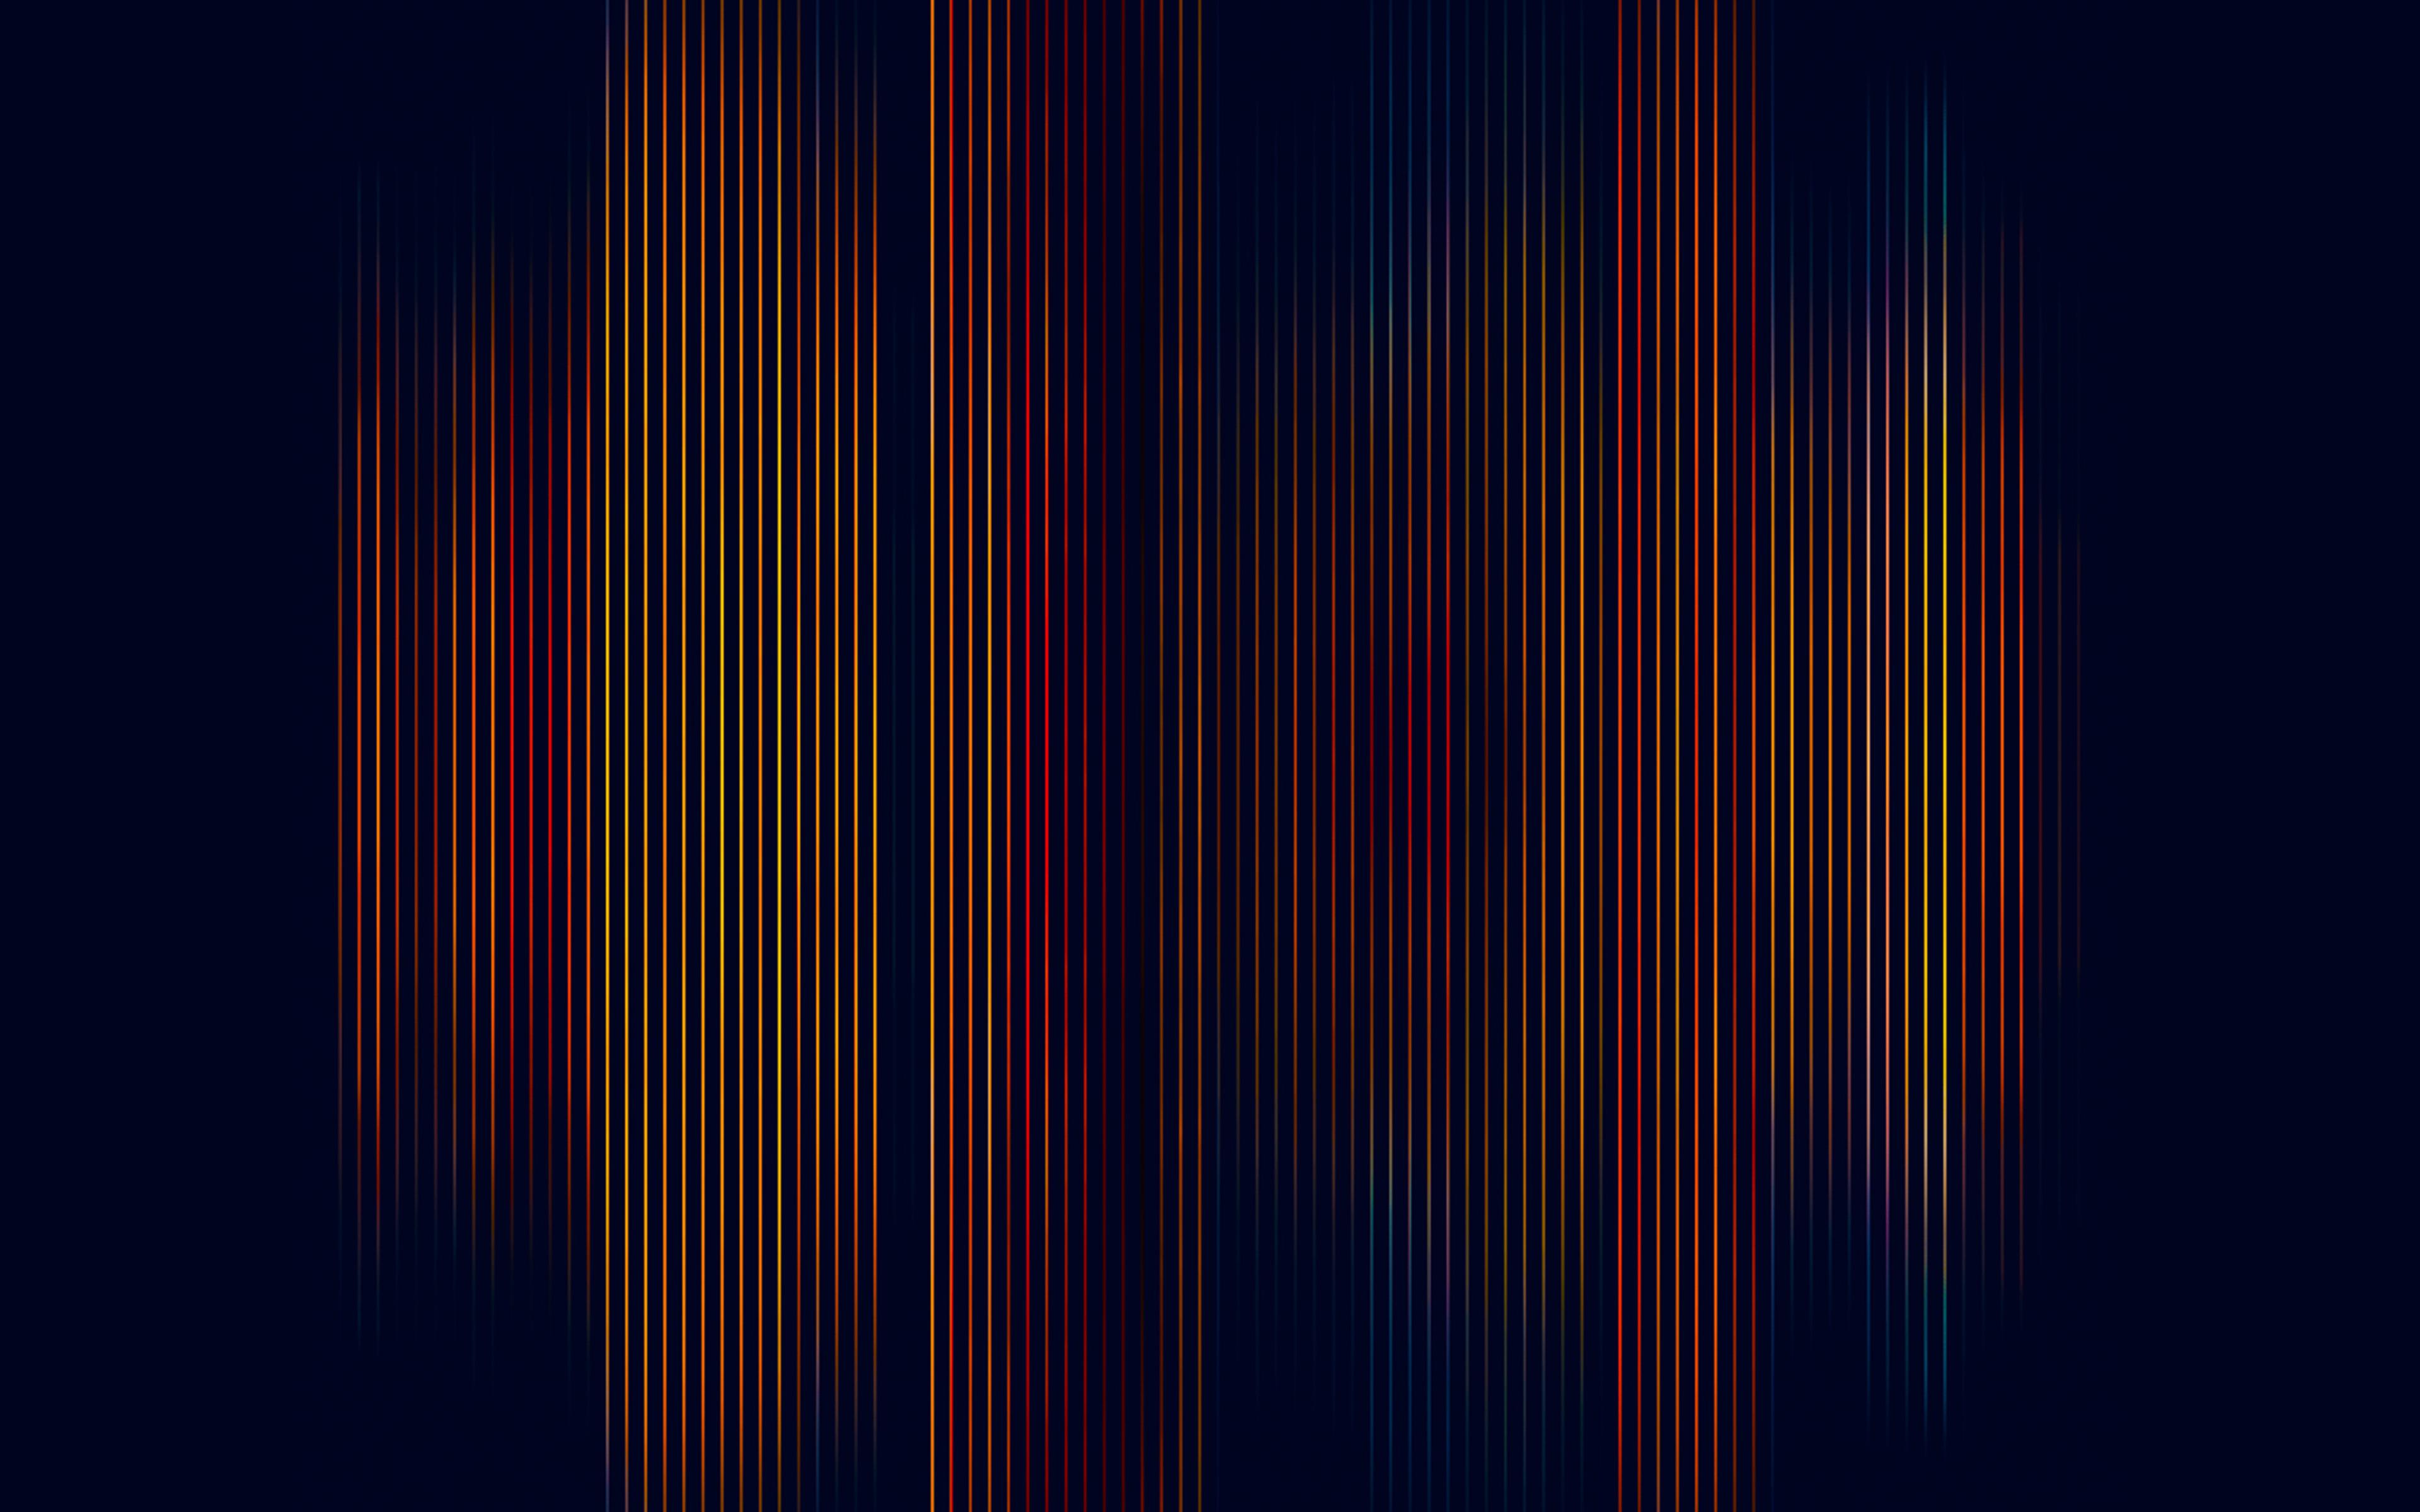 Dark Fall Android Wallpaper Vy87 Line Art Dark City Pattern Background Wallpaper